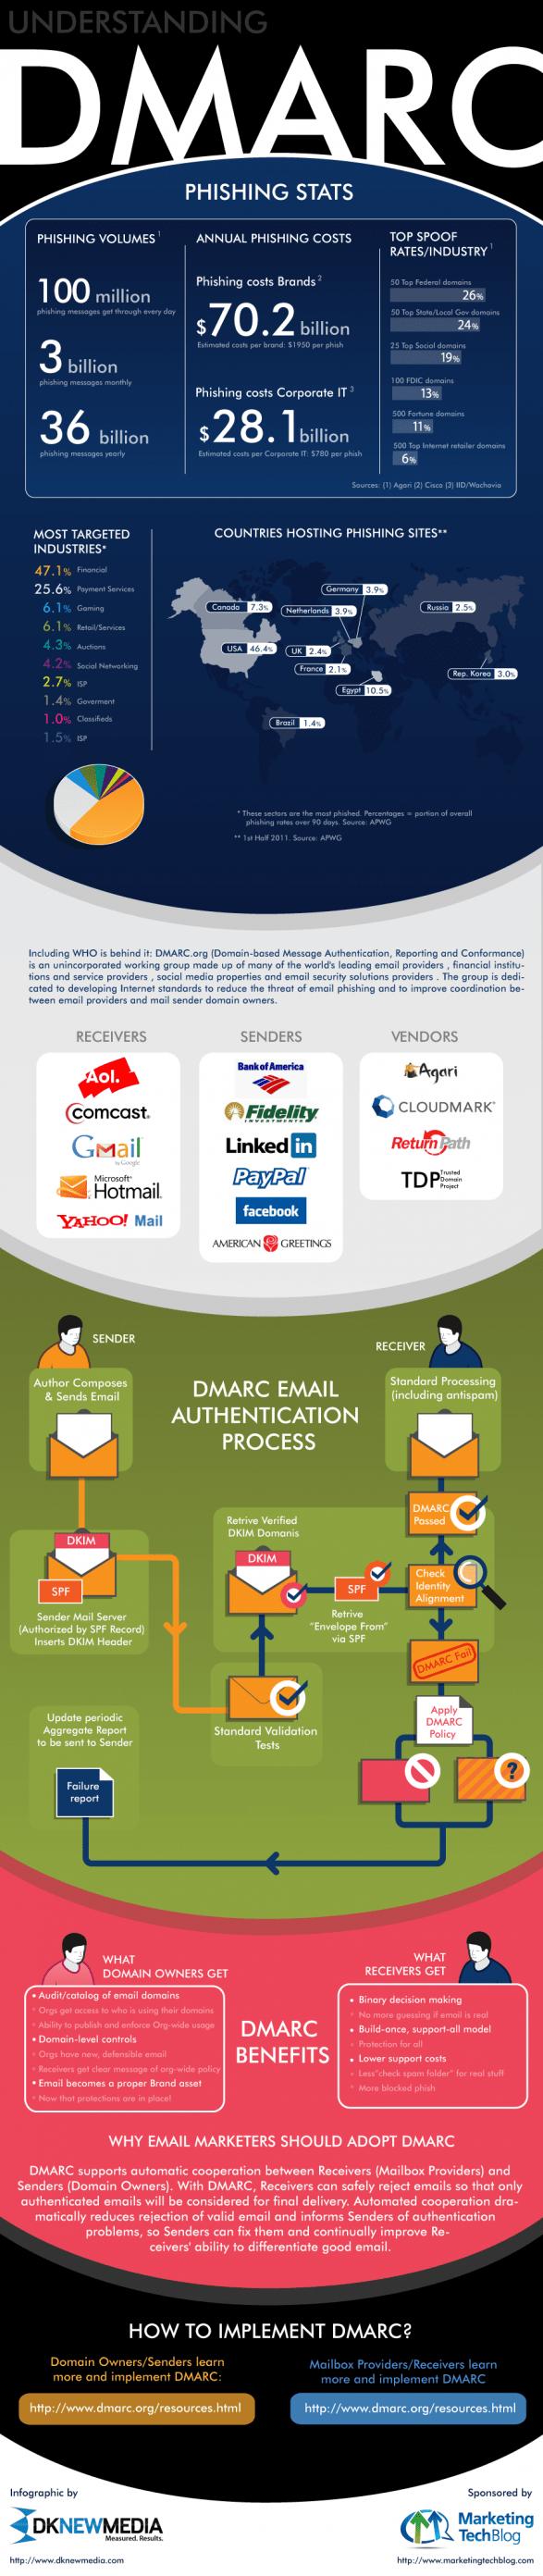 entendiendo DMARC